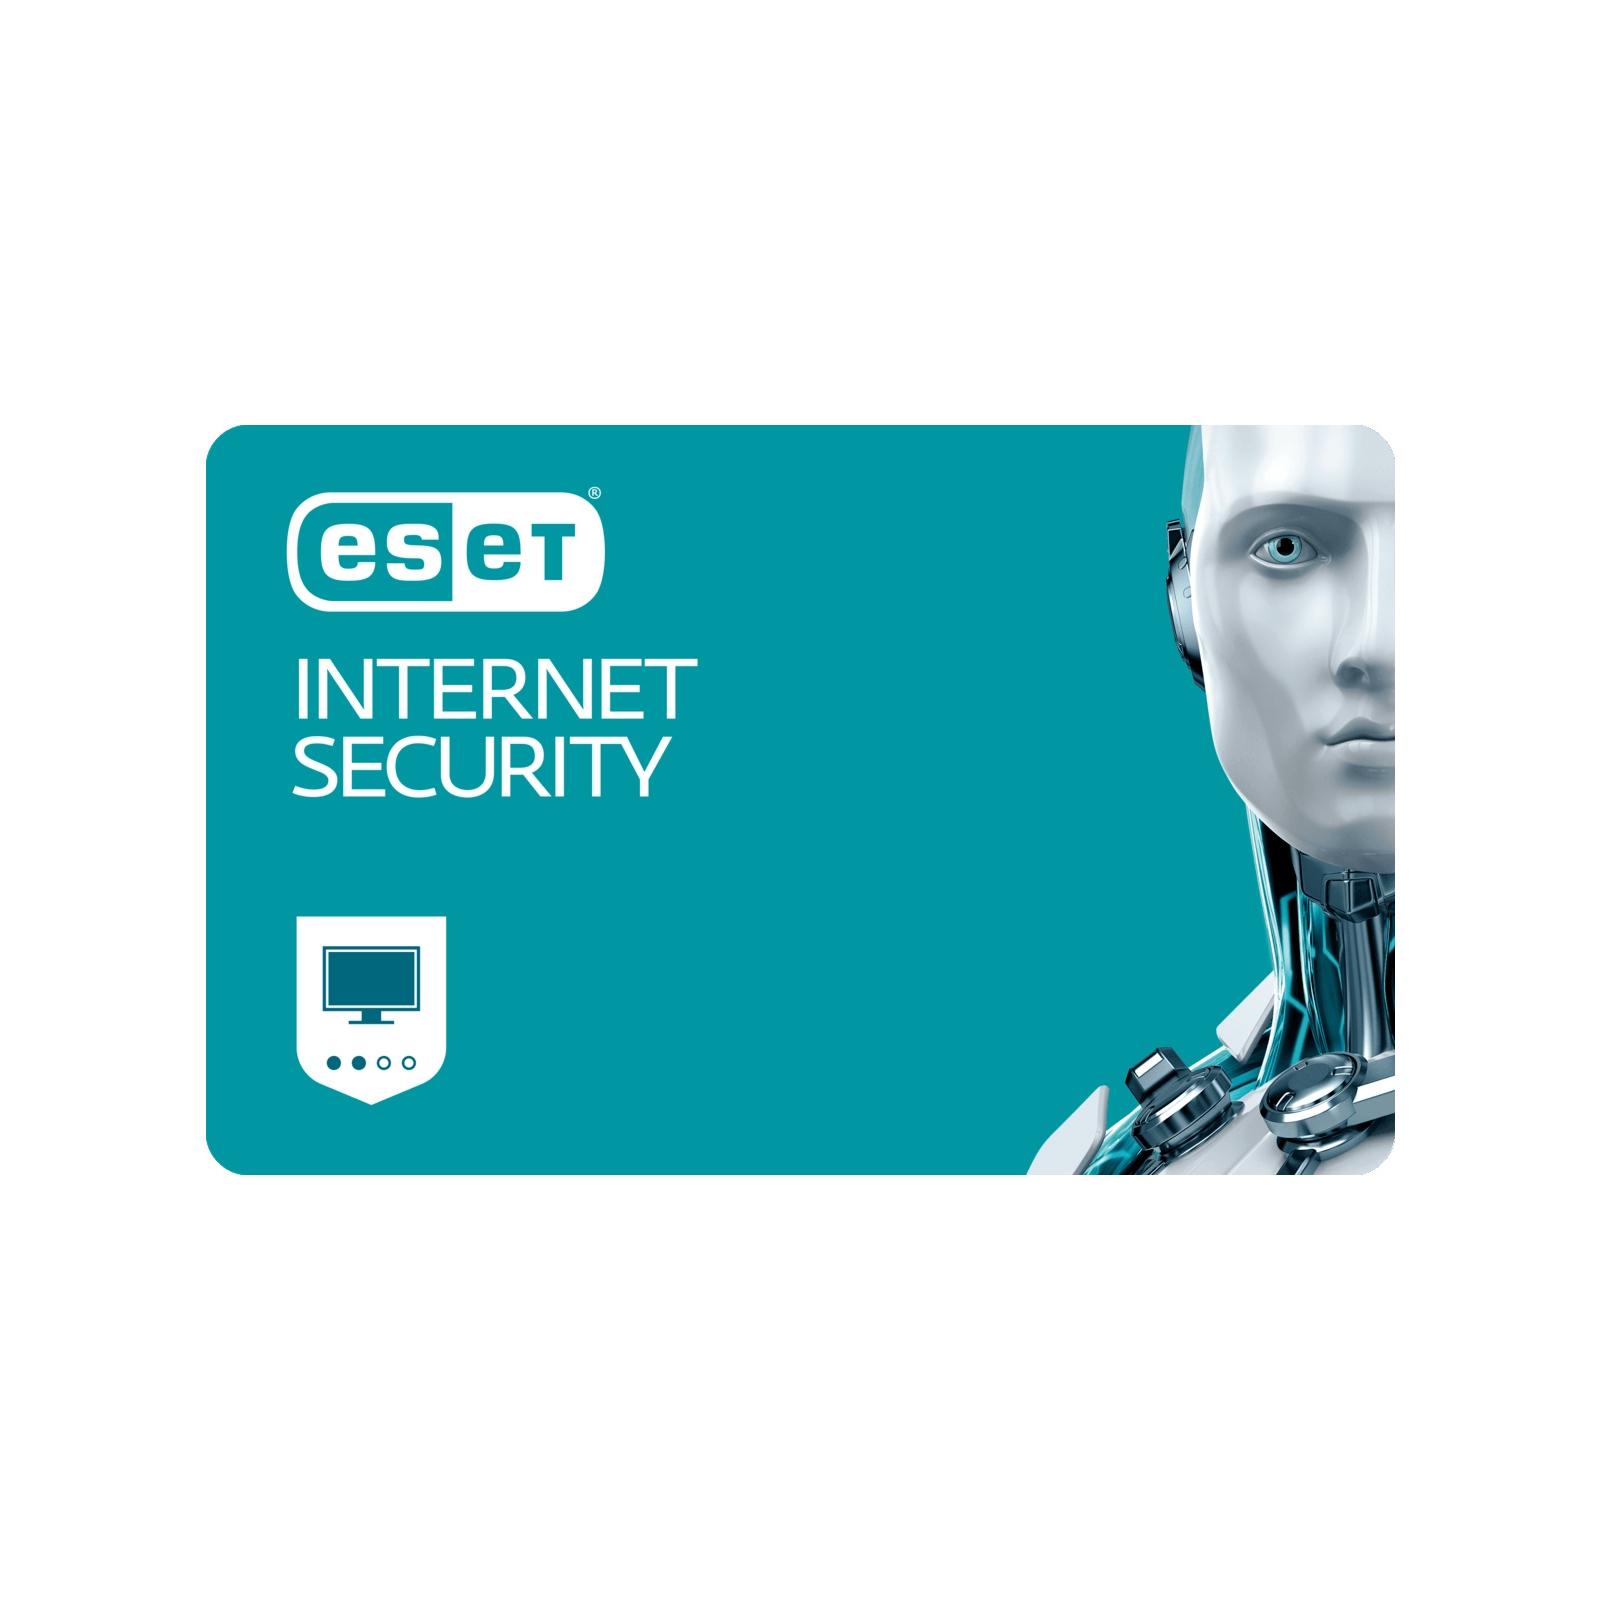 Антивірус Eset Internet Security 2ПК 12 мес. base/20 мес продление конверт (2012-1-key)